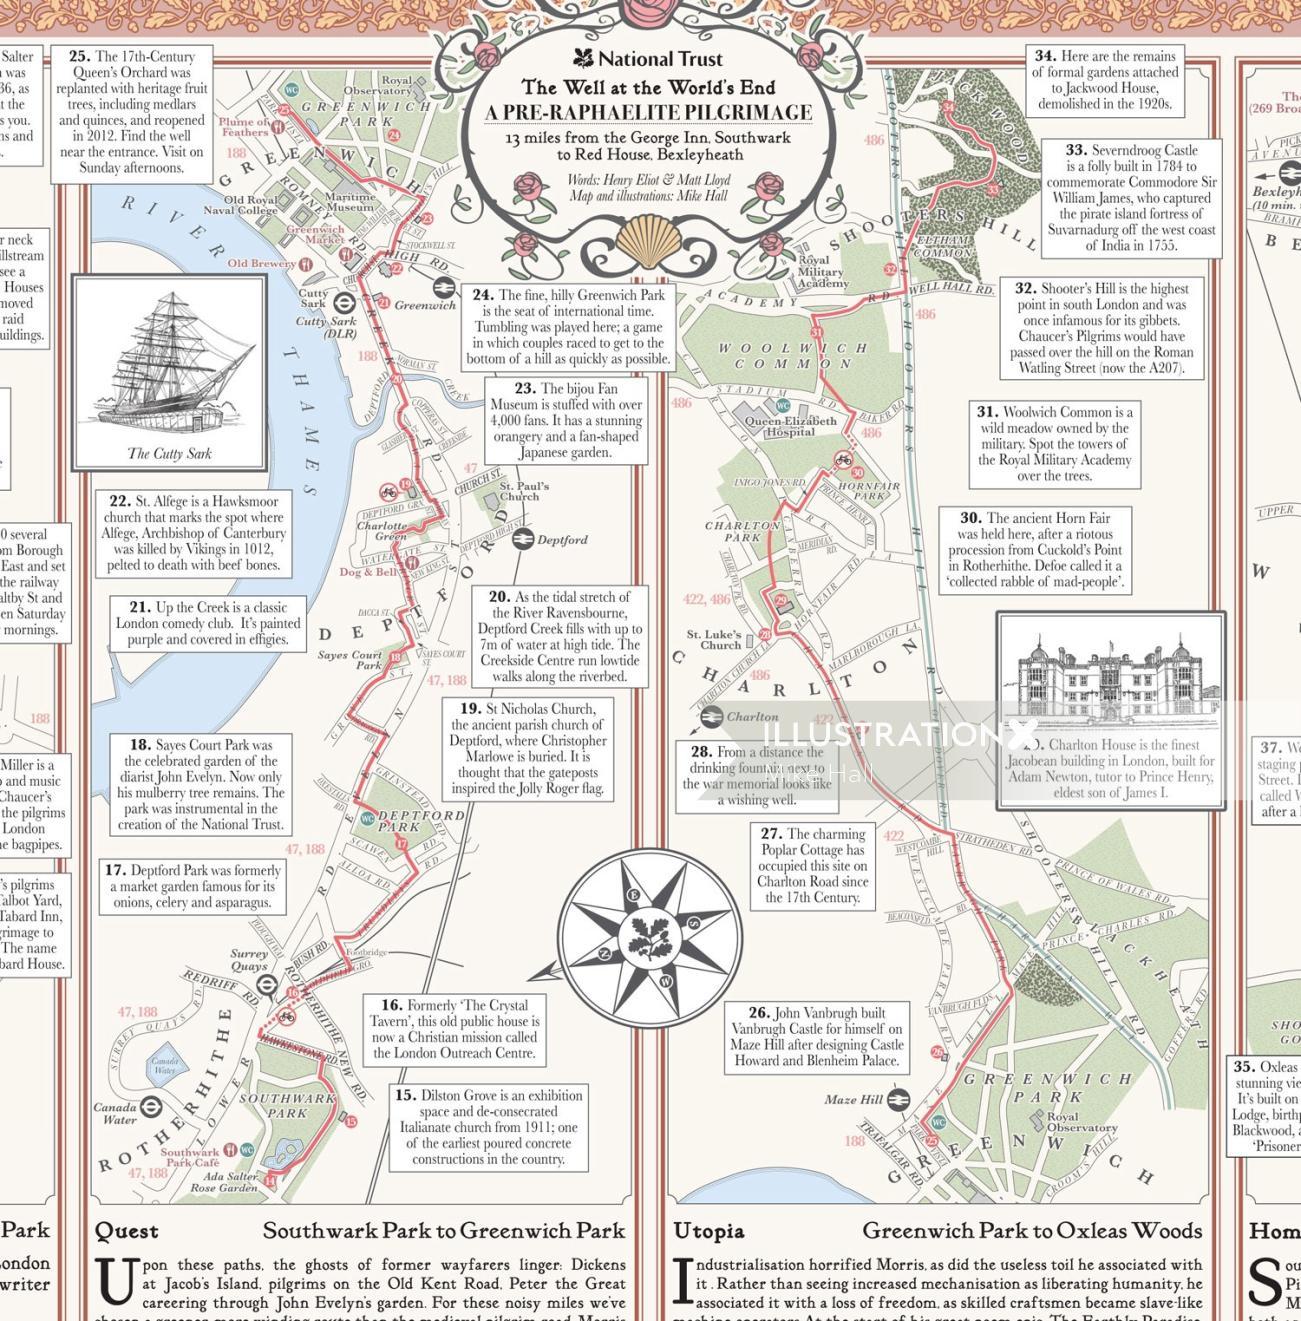 Pre-Raphaelite Pilgrimage Map (detail)